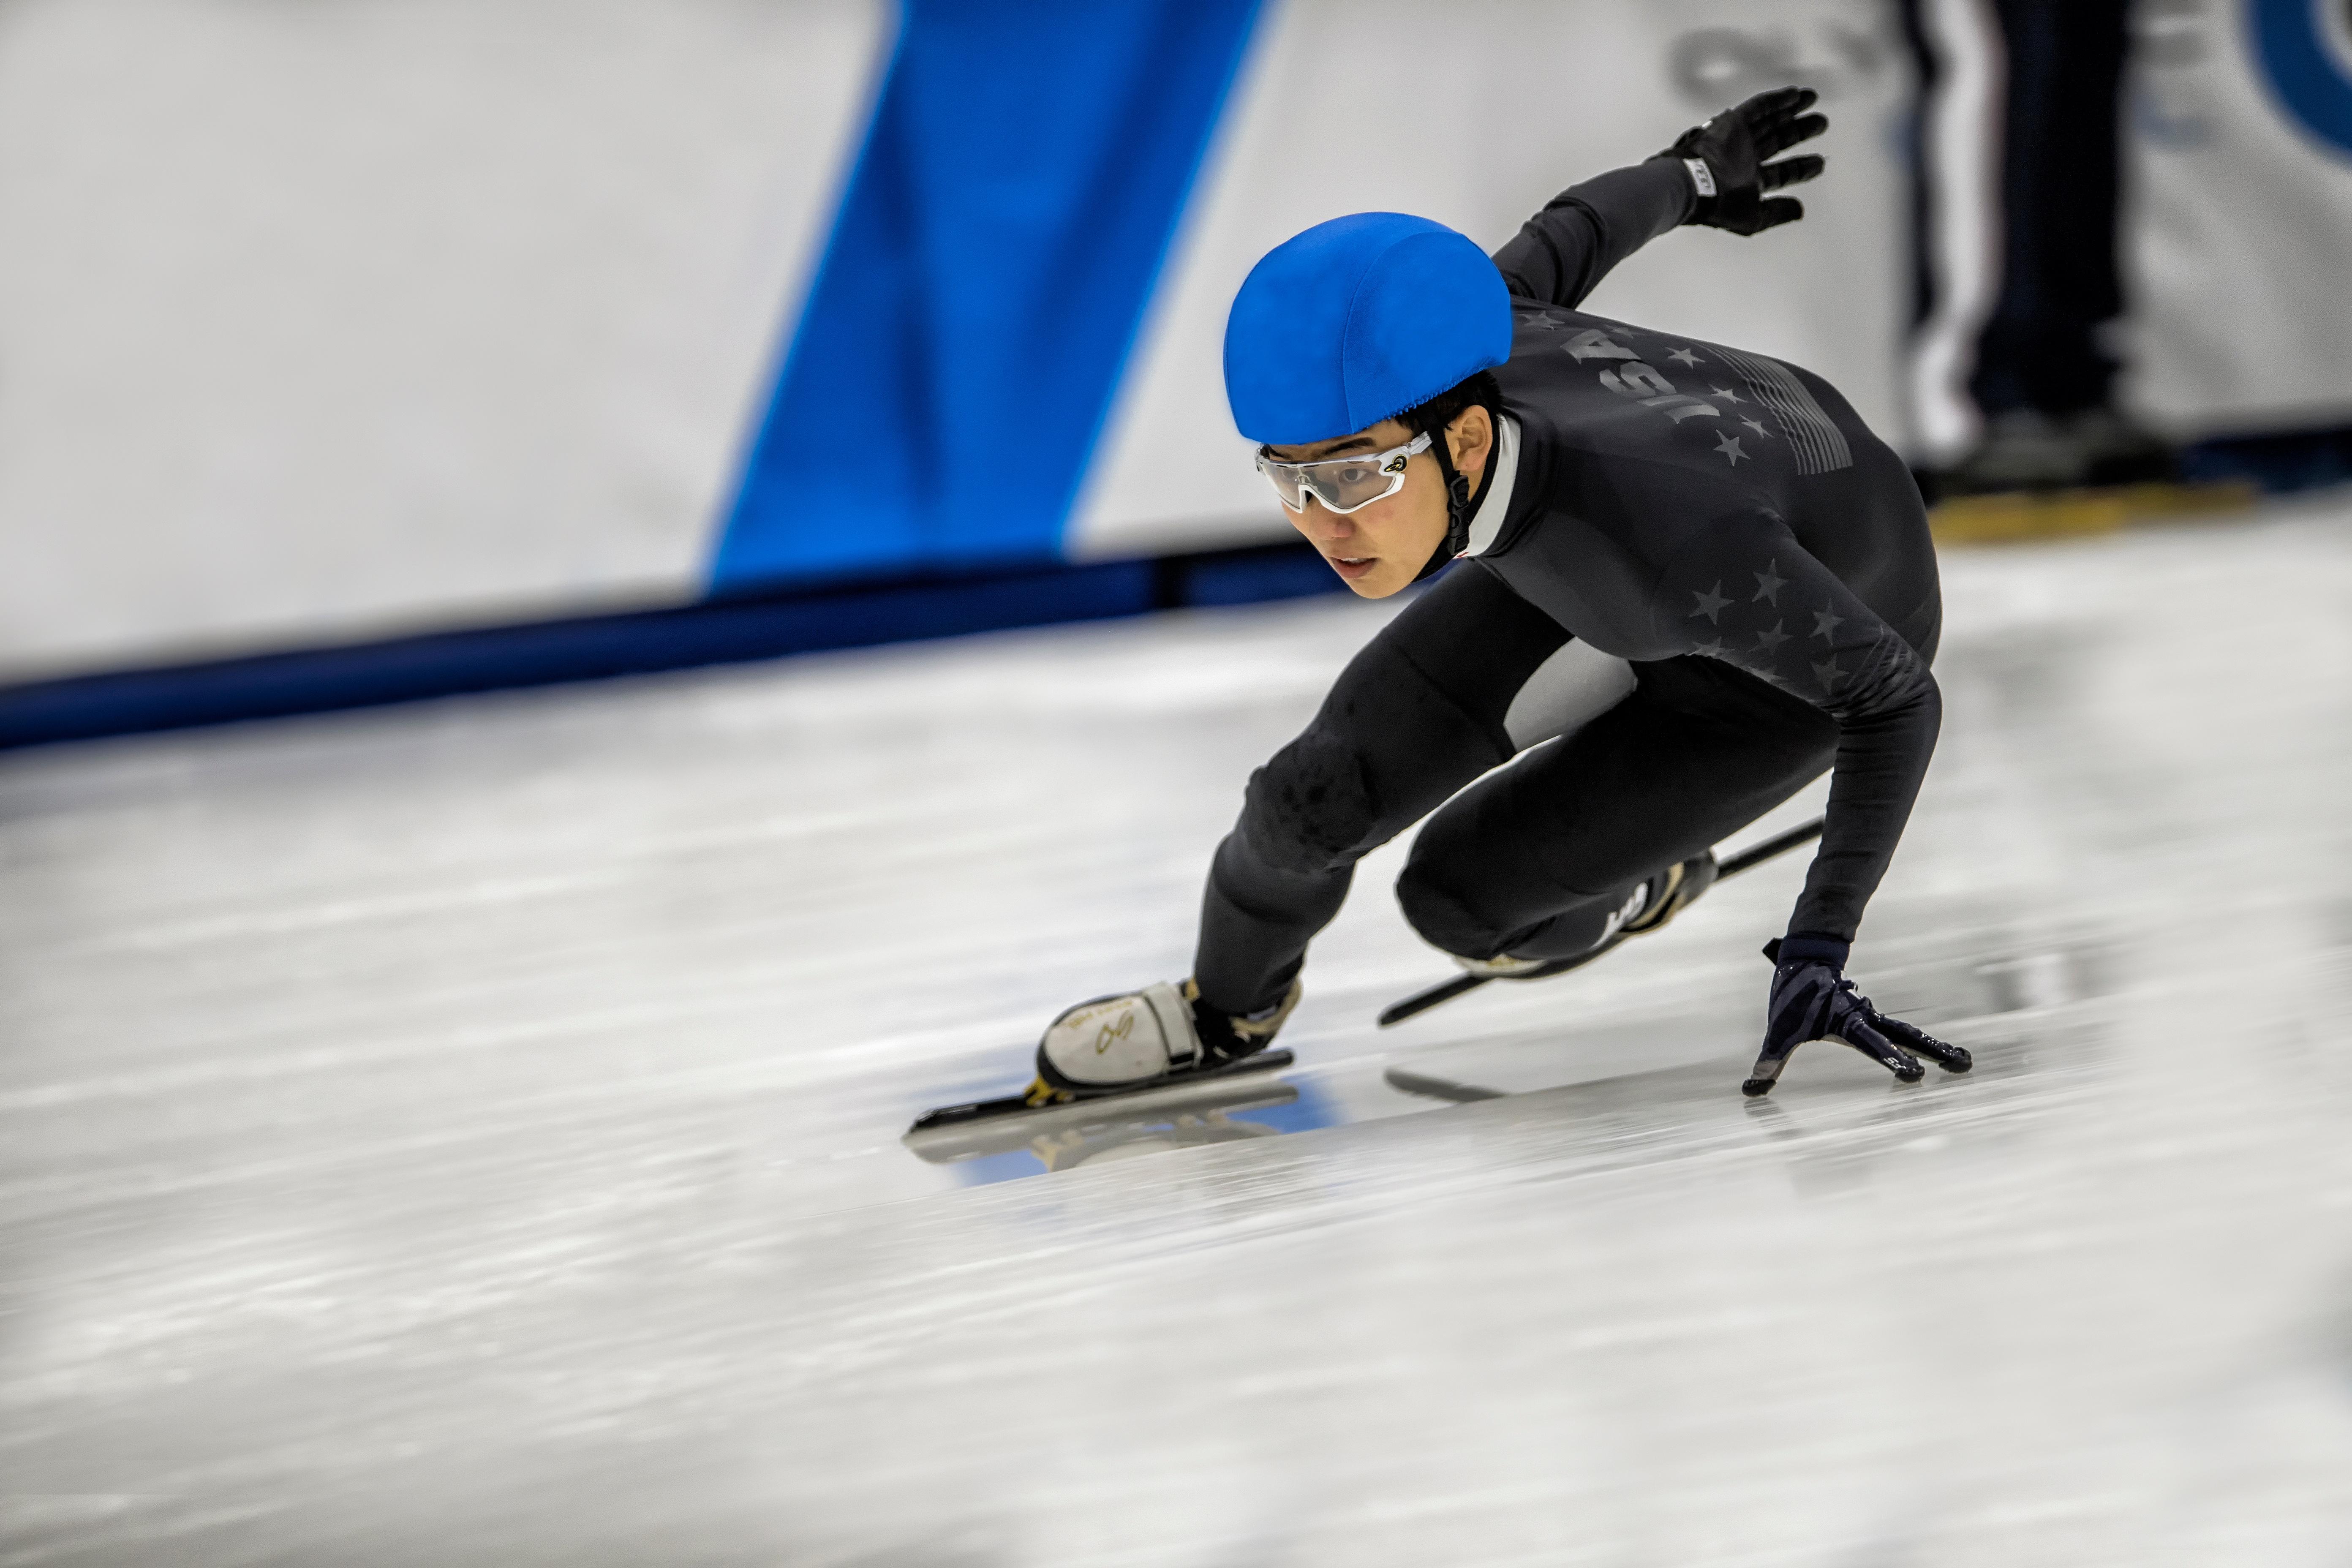 20171216-US-Speedskating-ST-Olympic-Trials-500m-0401-edit